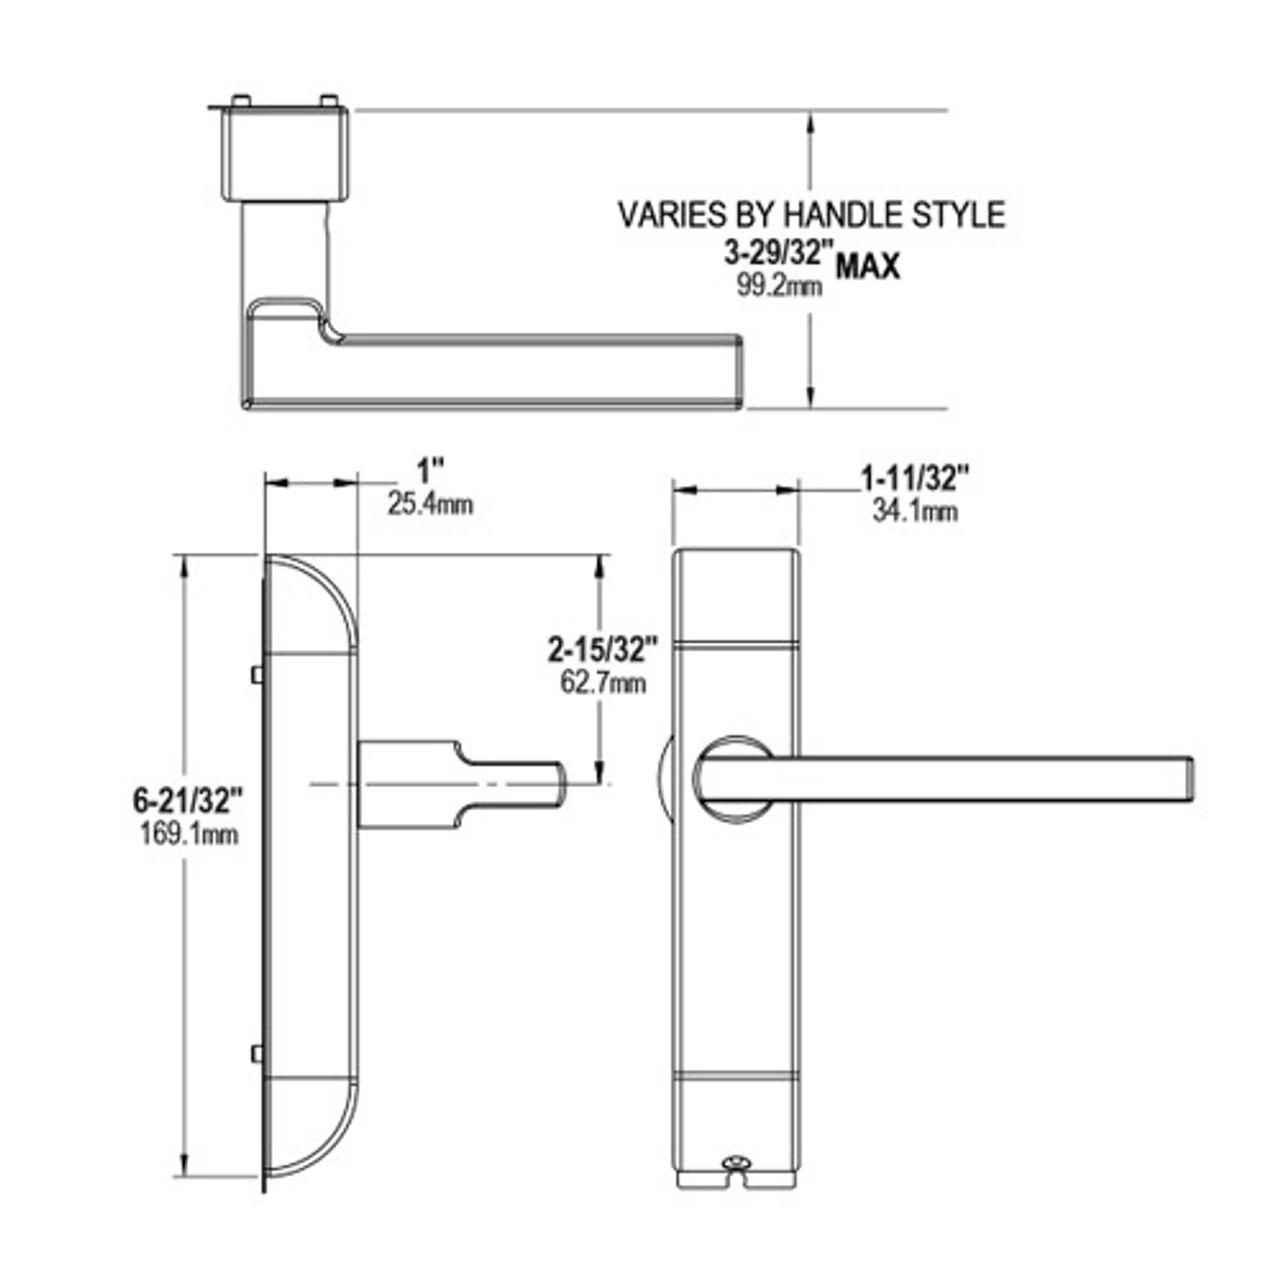 4600M-MD-532-US32D Adams Rite MD Designer handle Dimensional View